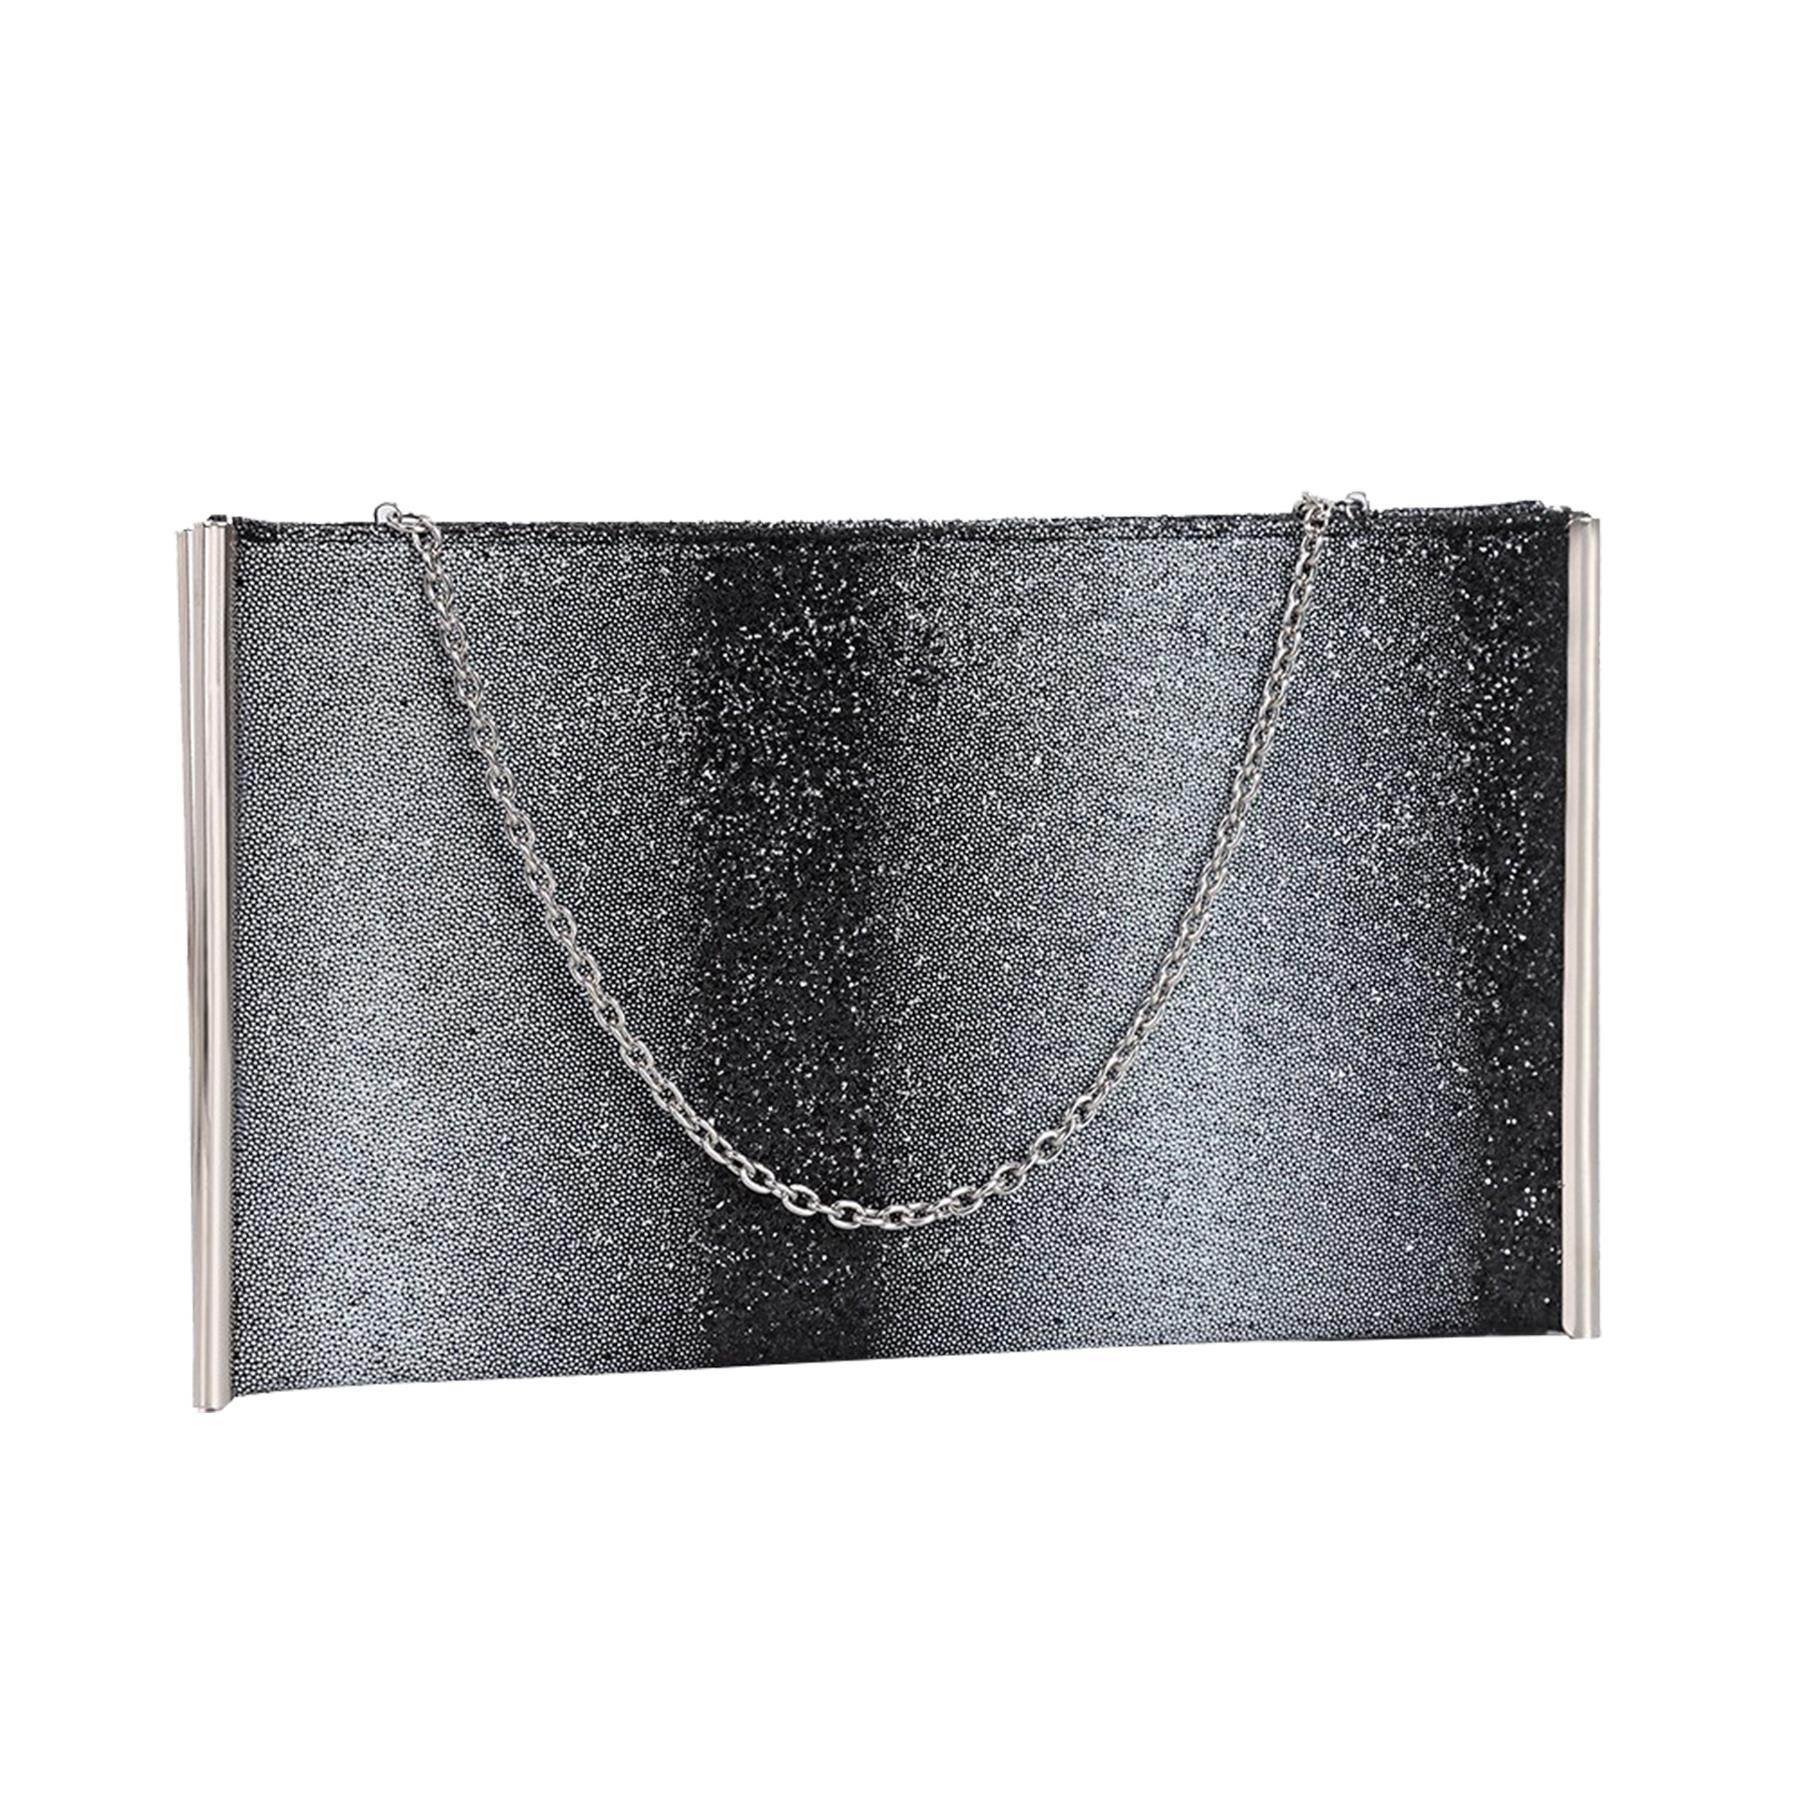 New-Ladies-Metallic-Trim-Velvet-Shimmer-Hologram-Croc-Evening-Clutch-Bag thumbnail 3